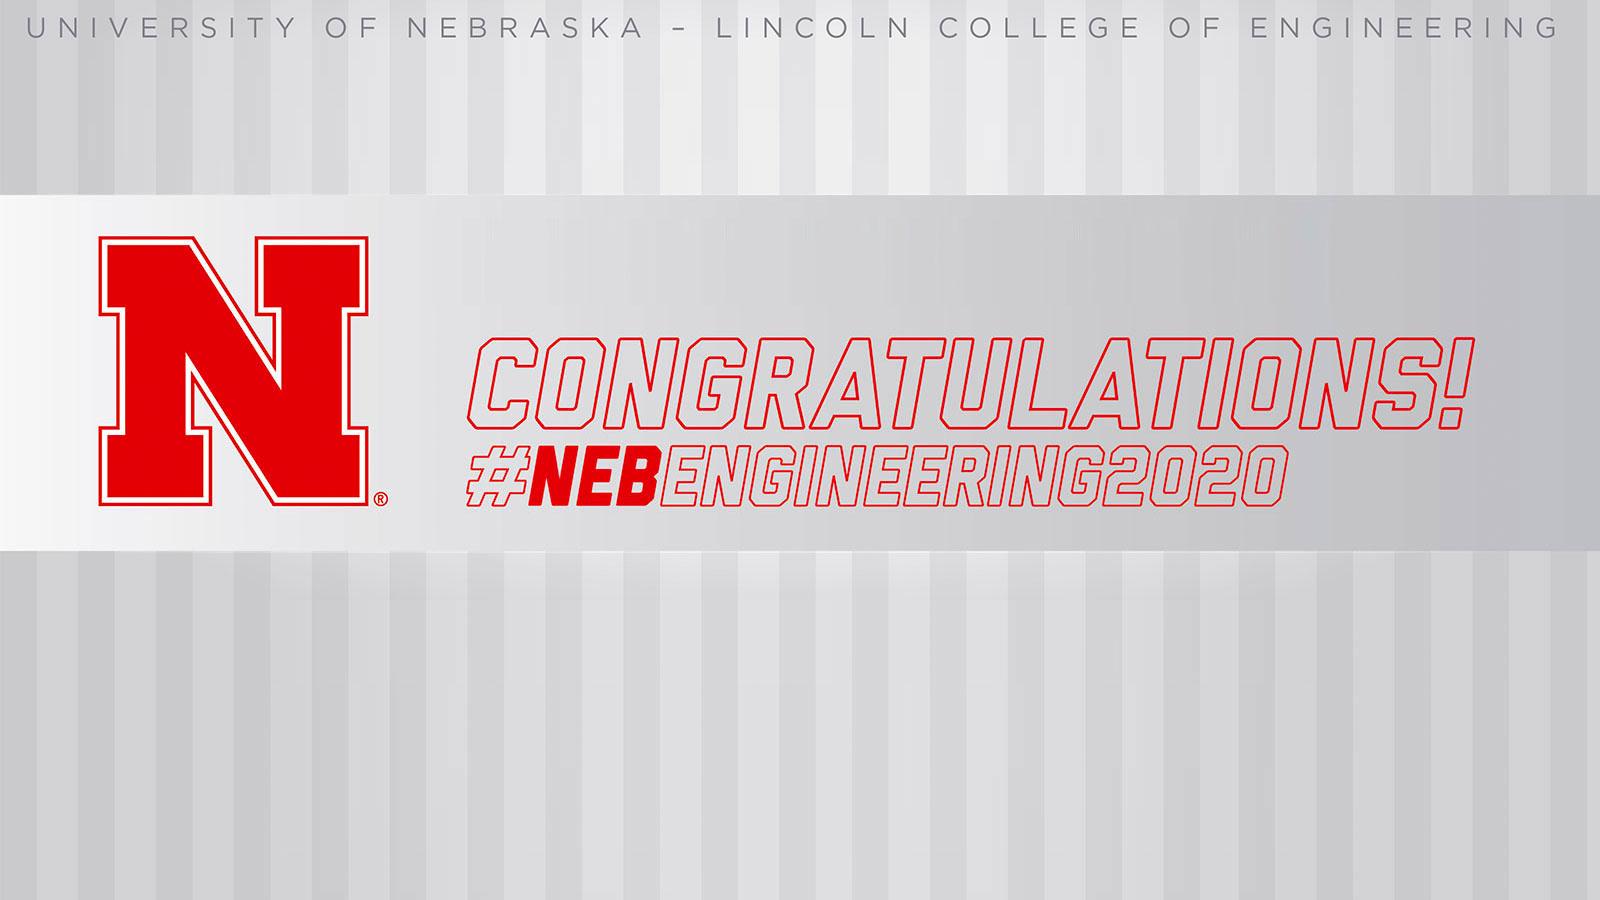 Senior Recognition - Congratulations! - #NEBENGINEERING2020